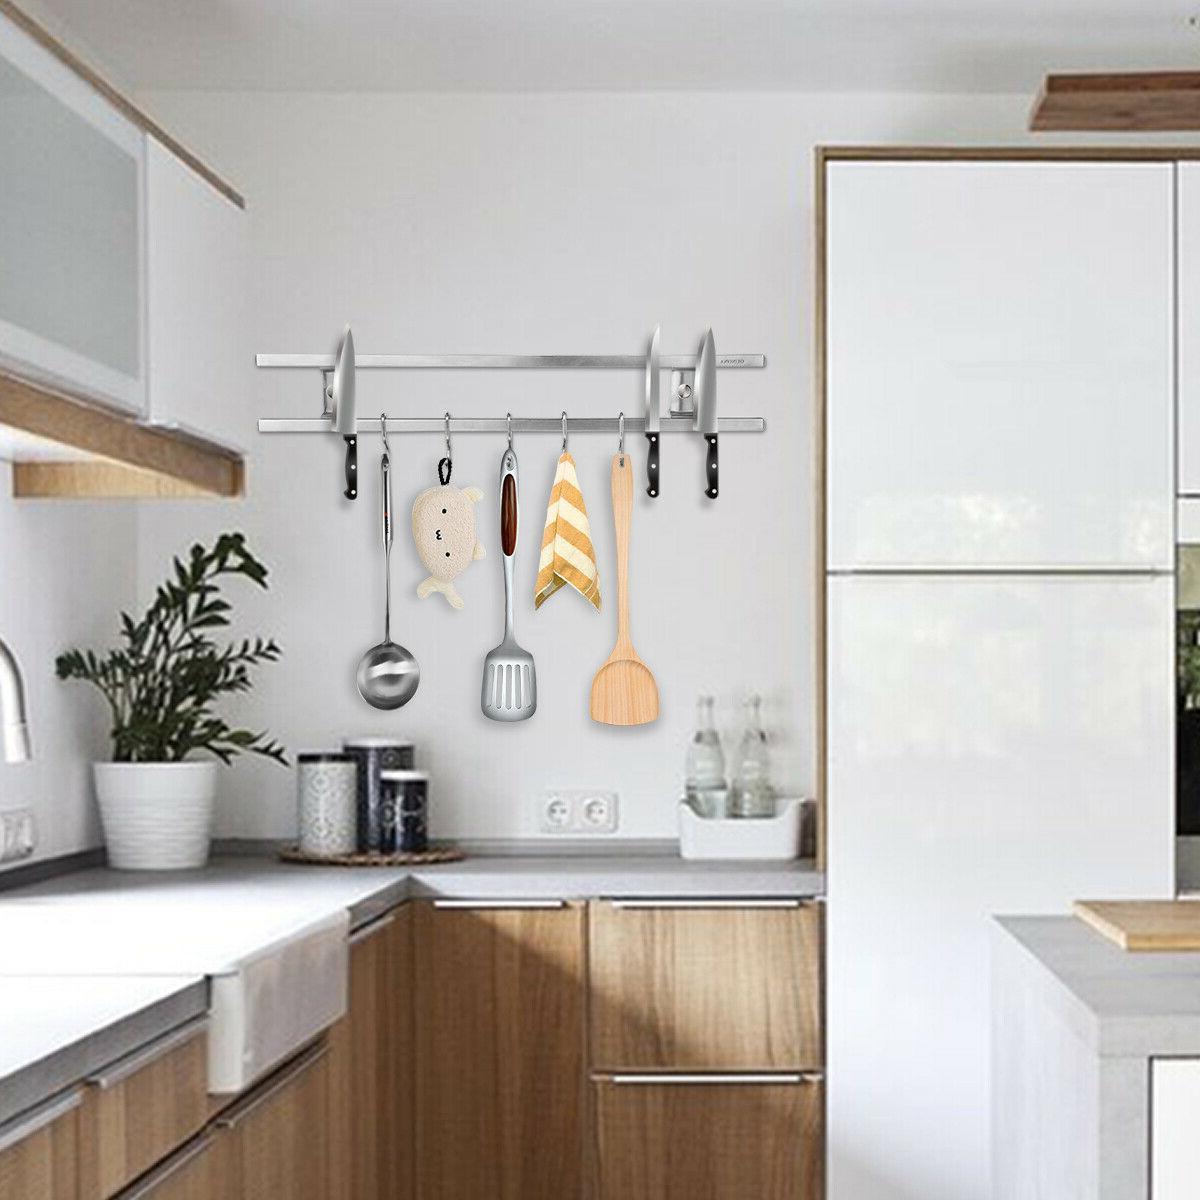 16 Magnetic Knife Holder Wall Kitchen Tools Set